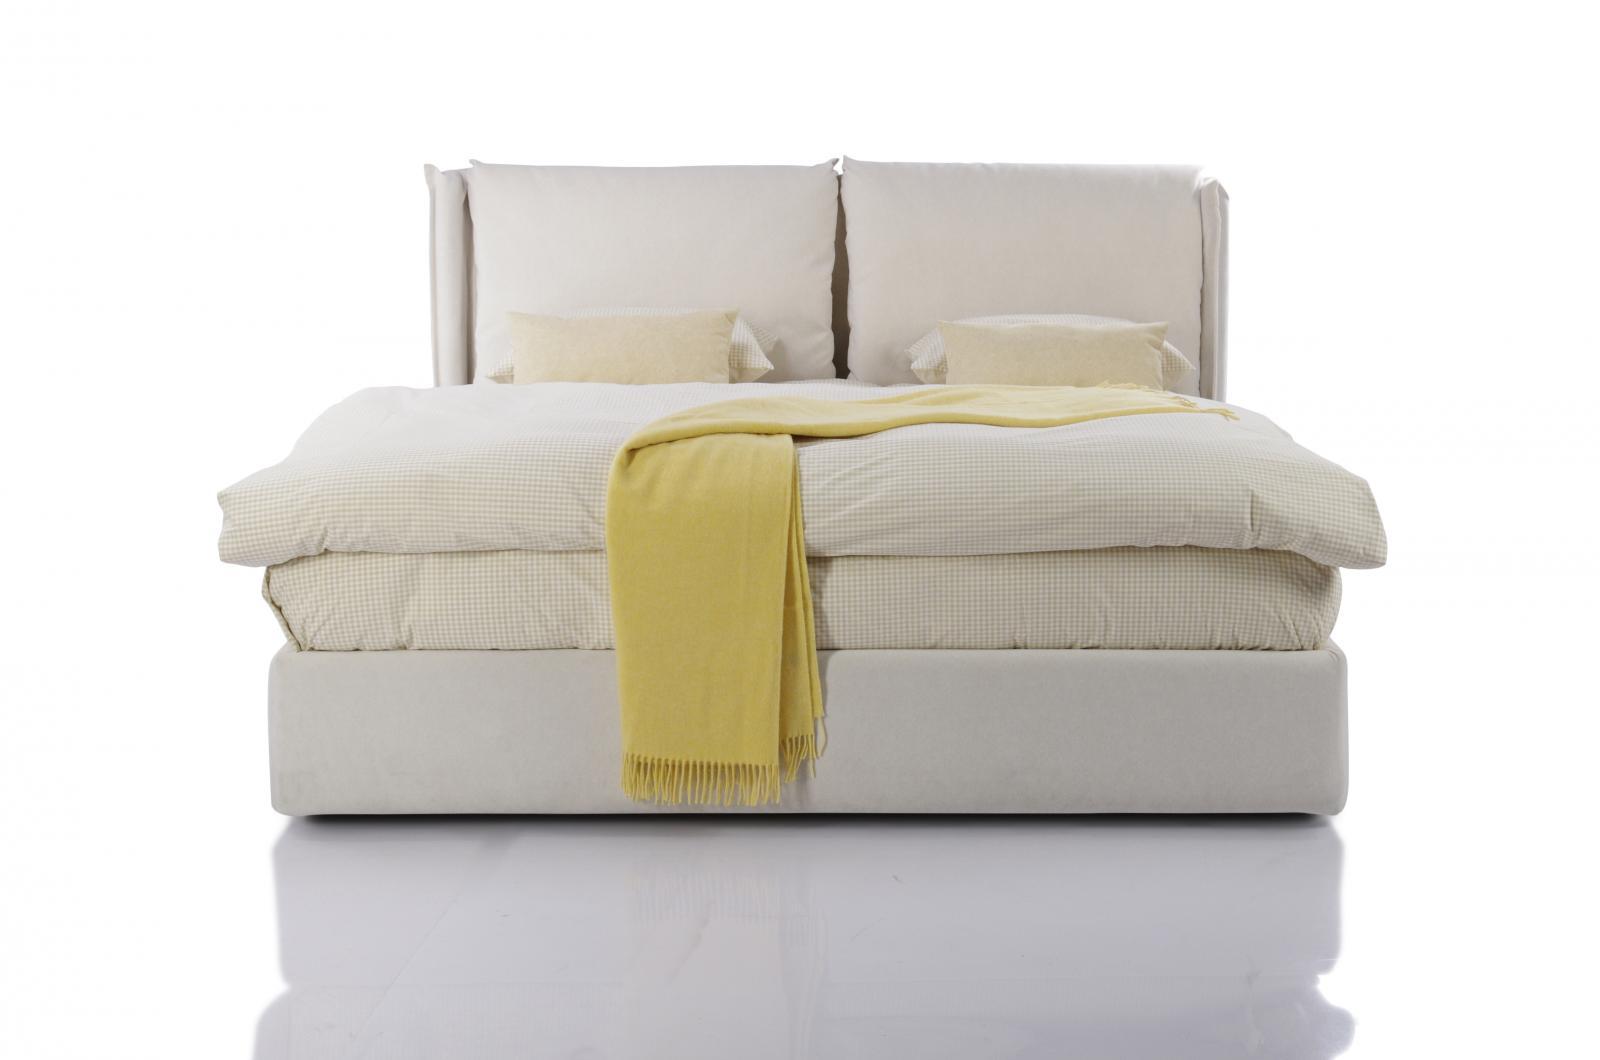 Кровать Alfabed Avenue 160х200